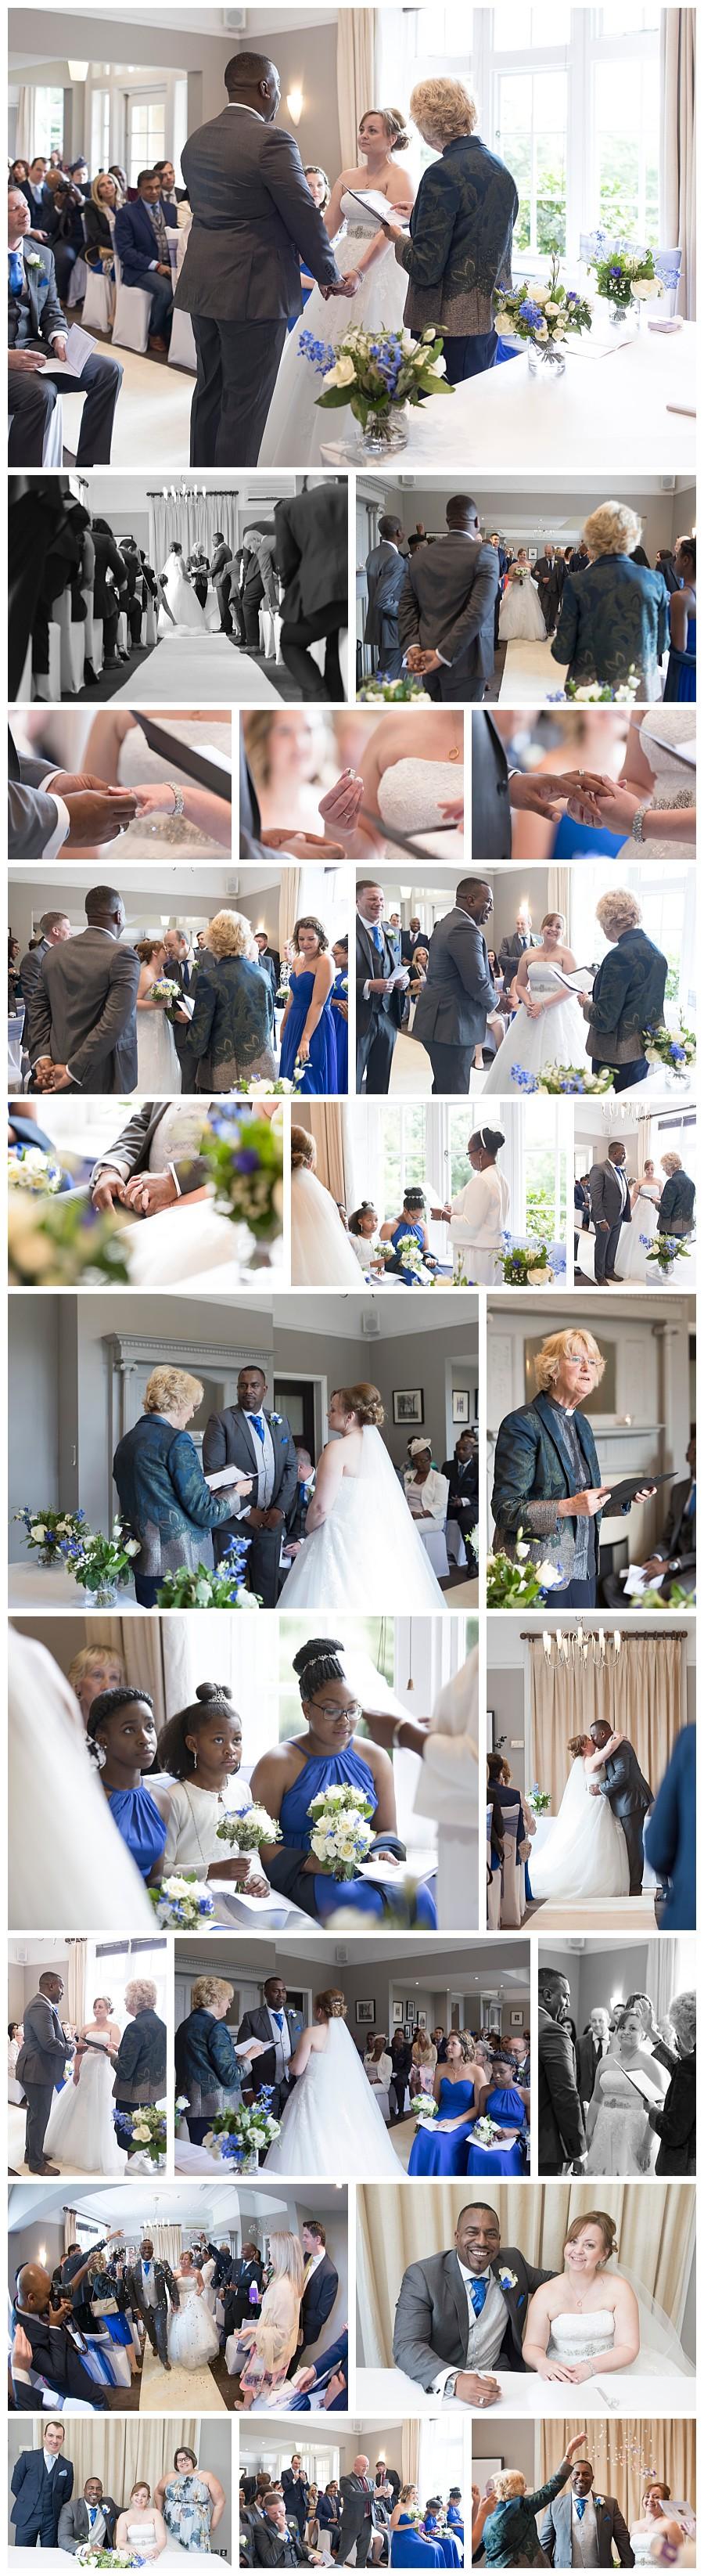 Wedding Photography Woodlands Hotel Leeds, vow renewal photography Leeds, woodlands hotel wedding photographers